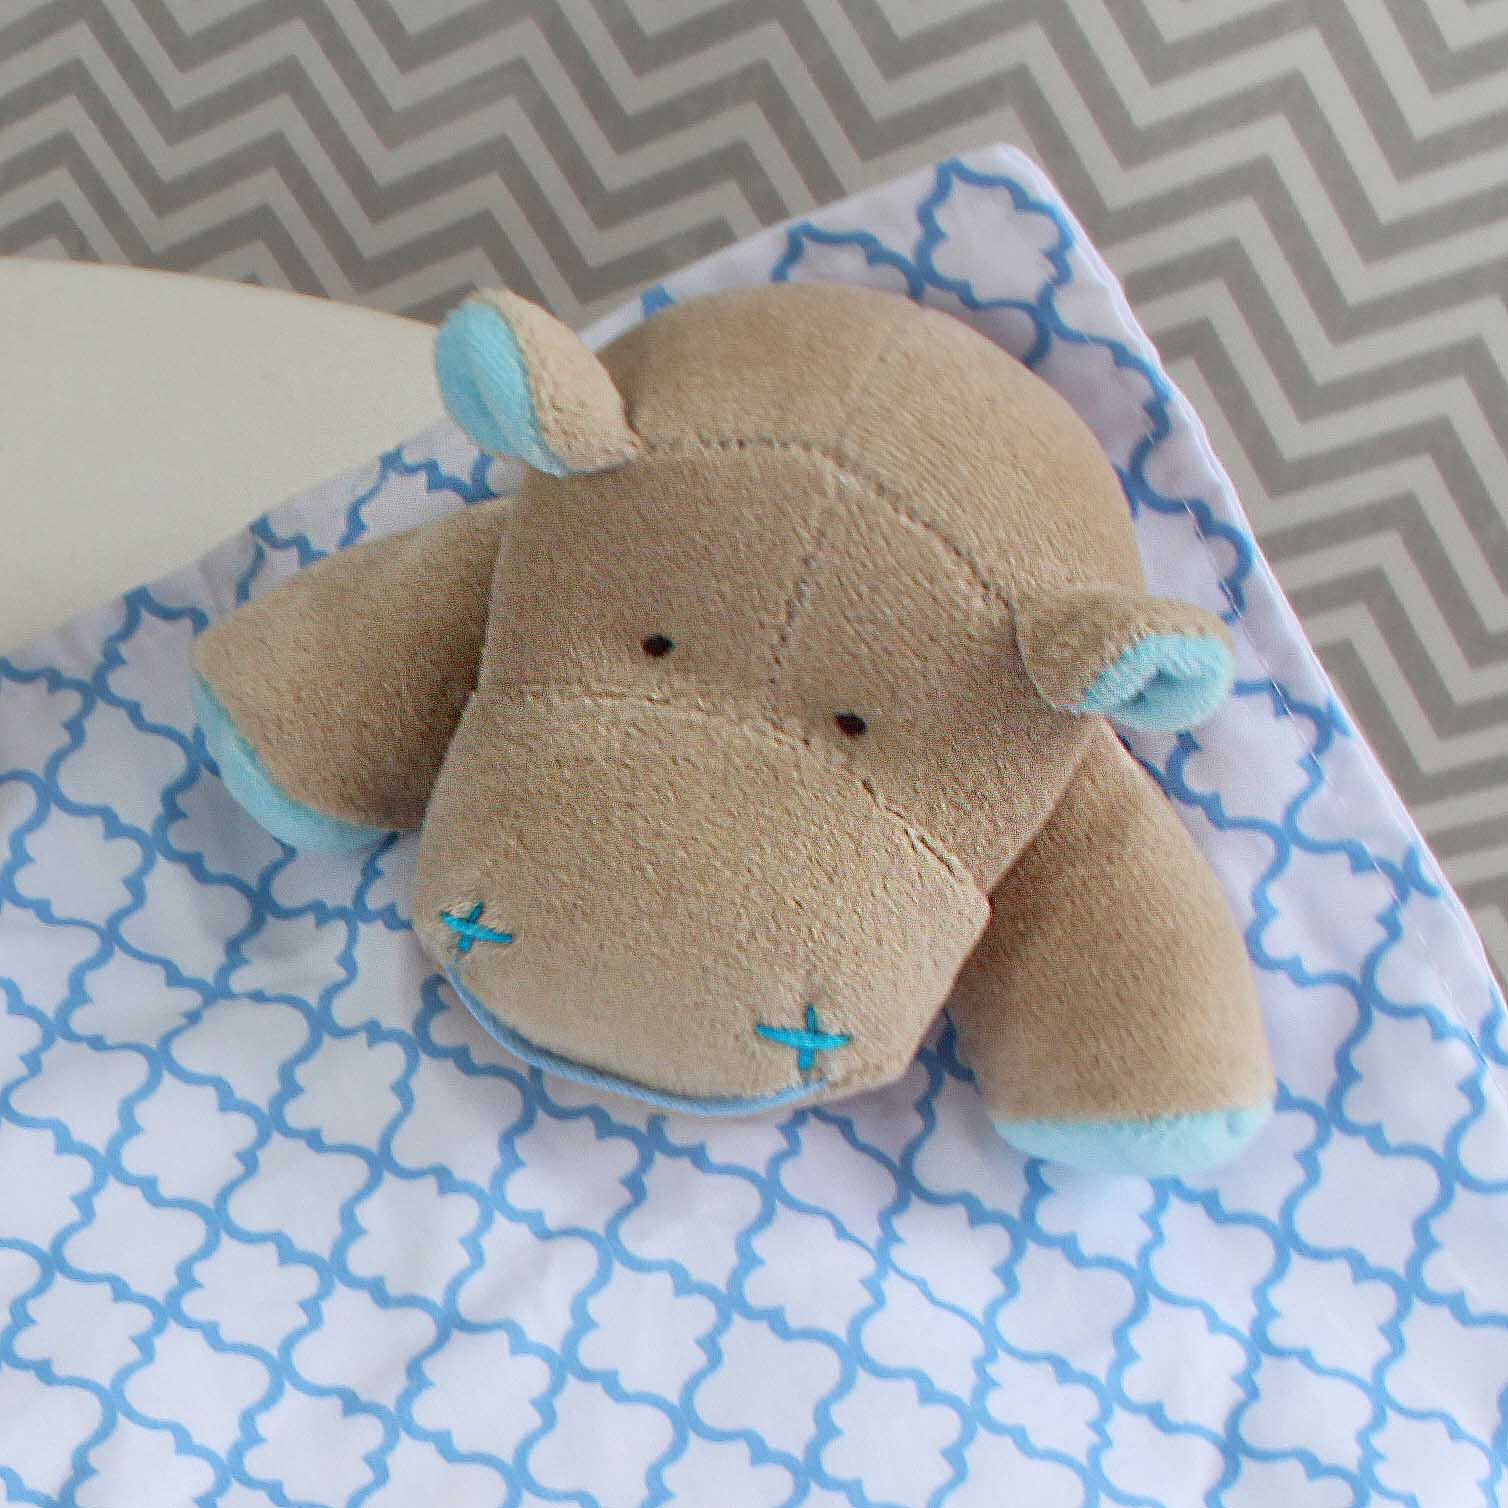 Naninha c/ Porta Chupeta - Hipopótamo Azul